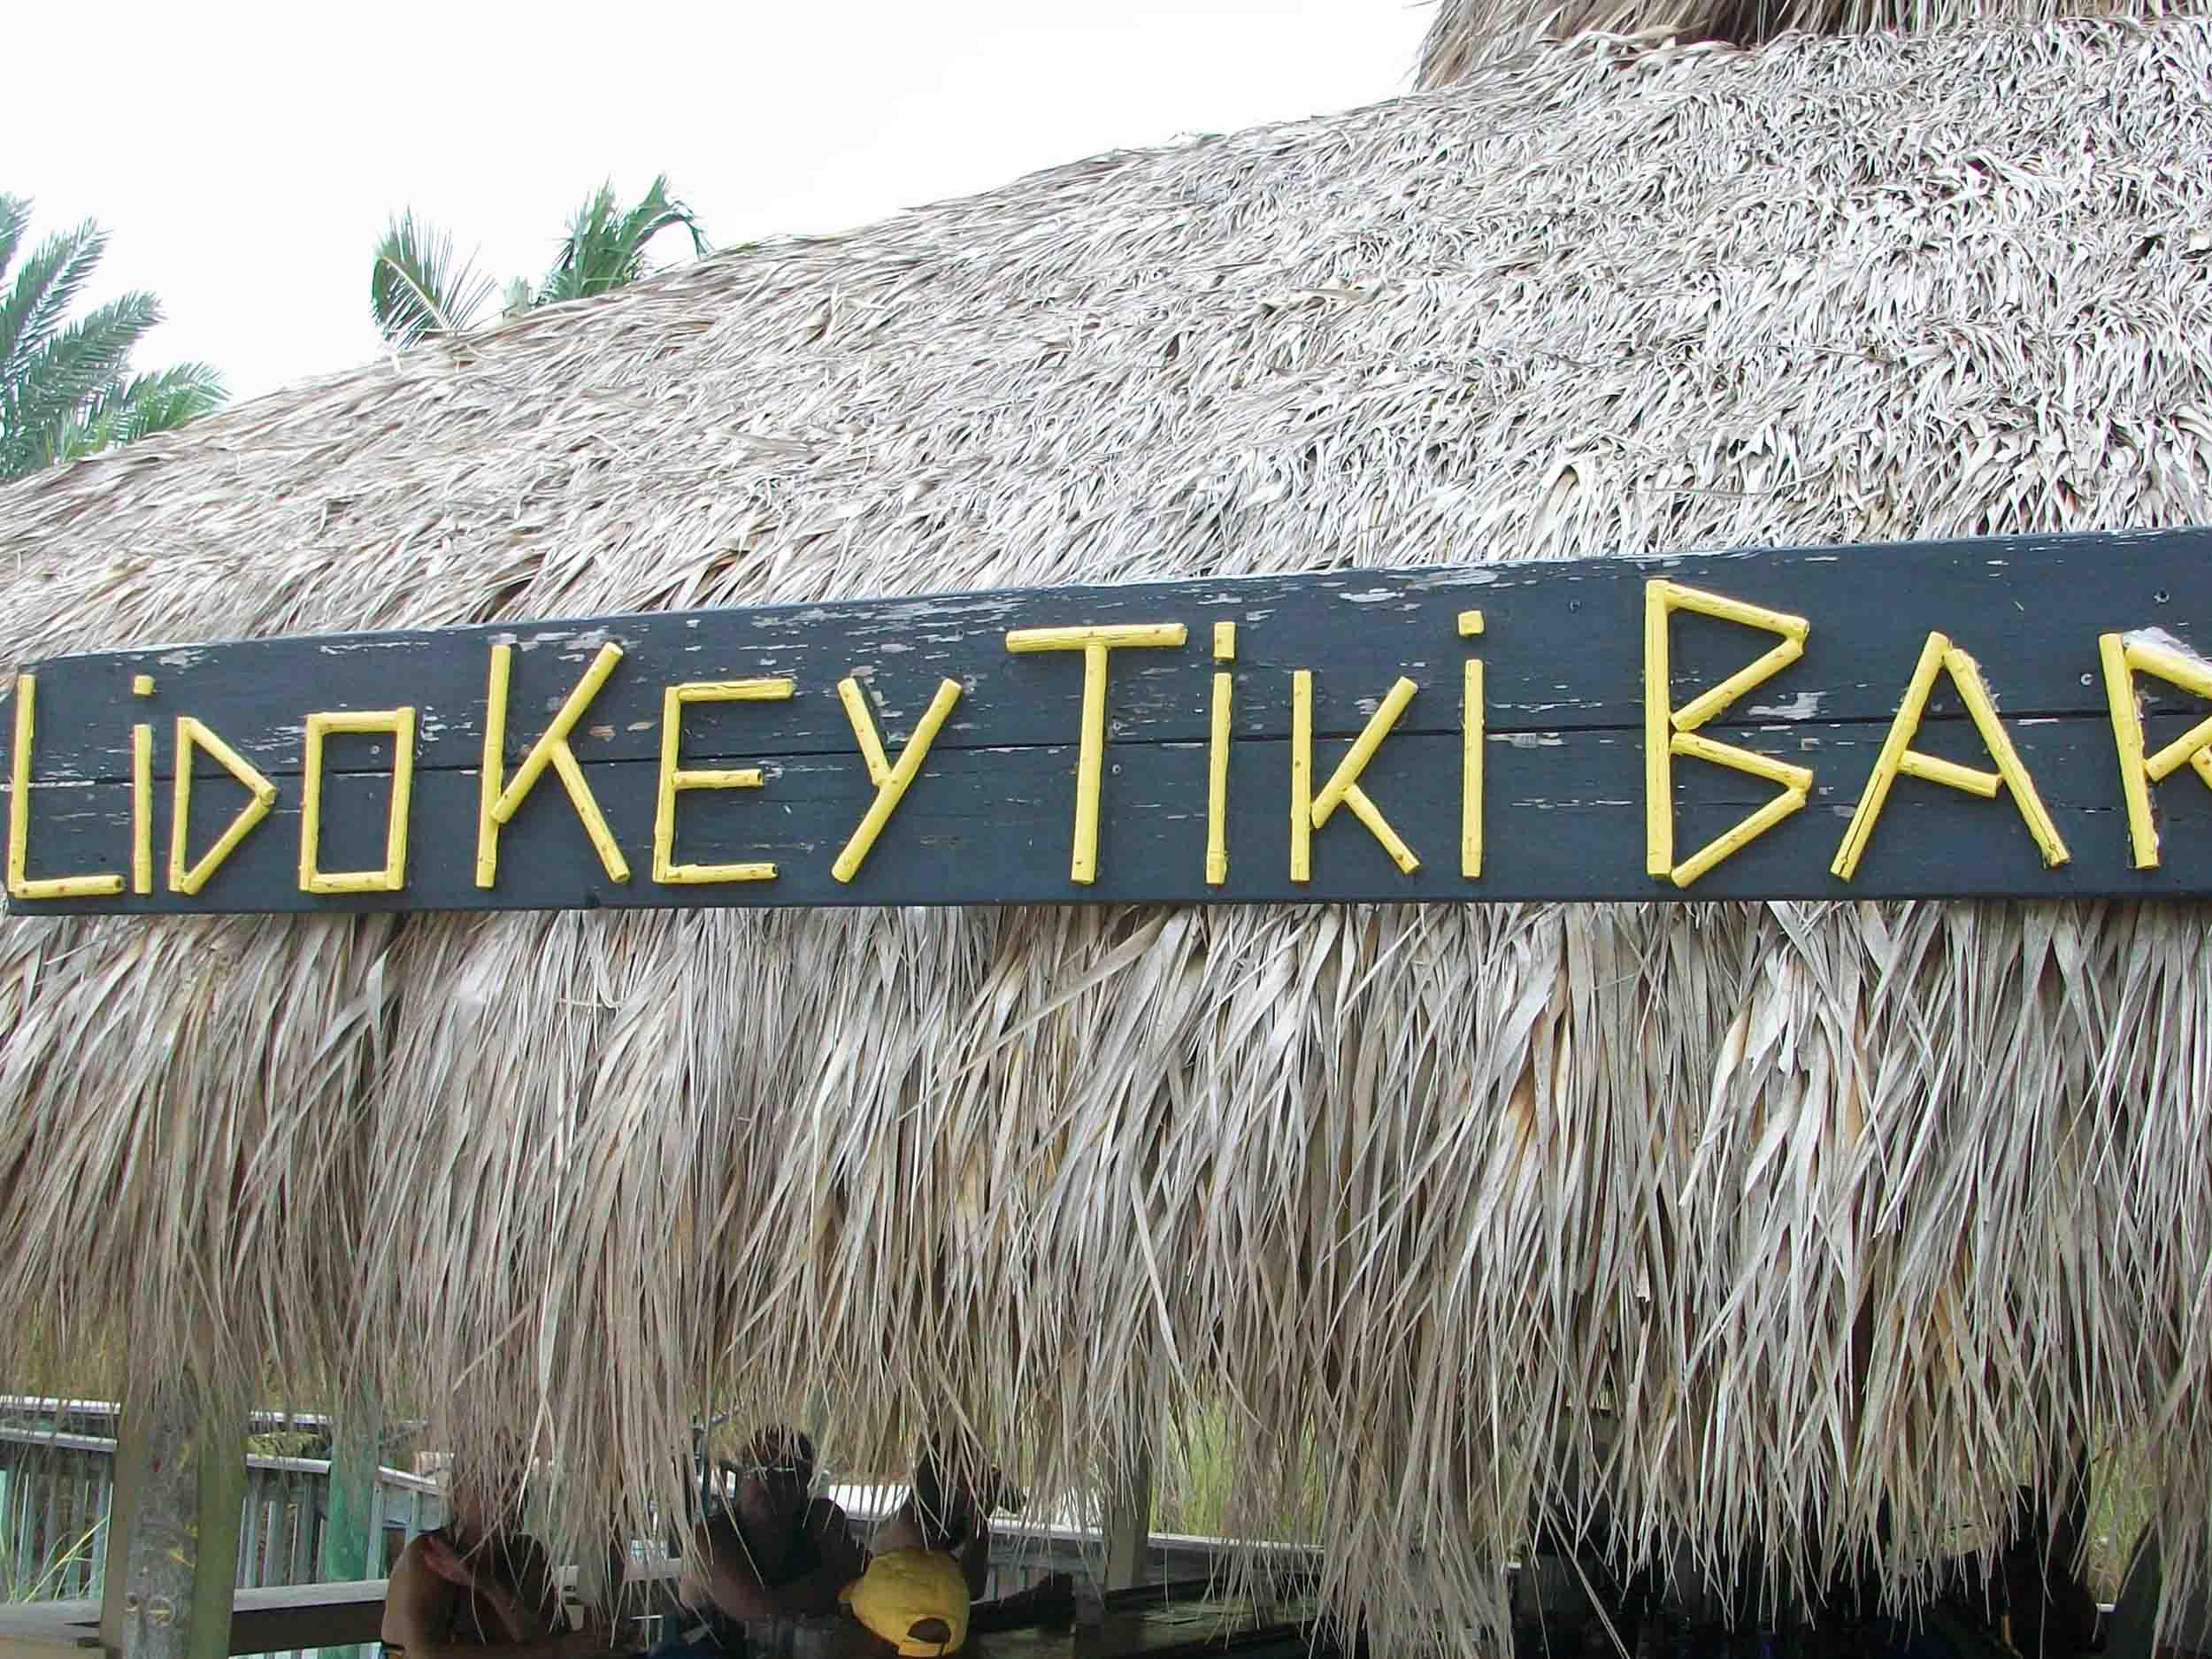 Lido Key Tiki Bar Sign